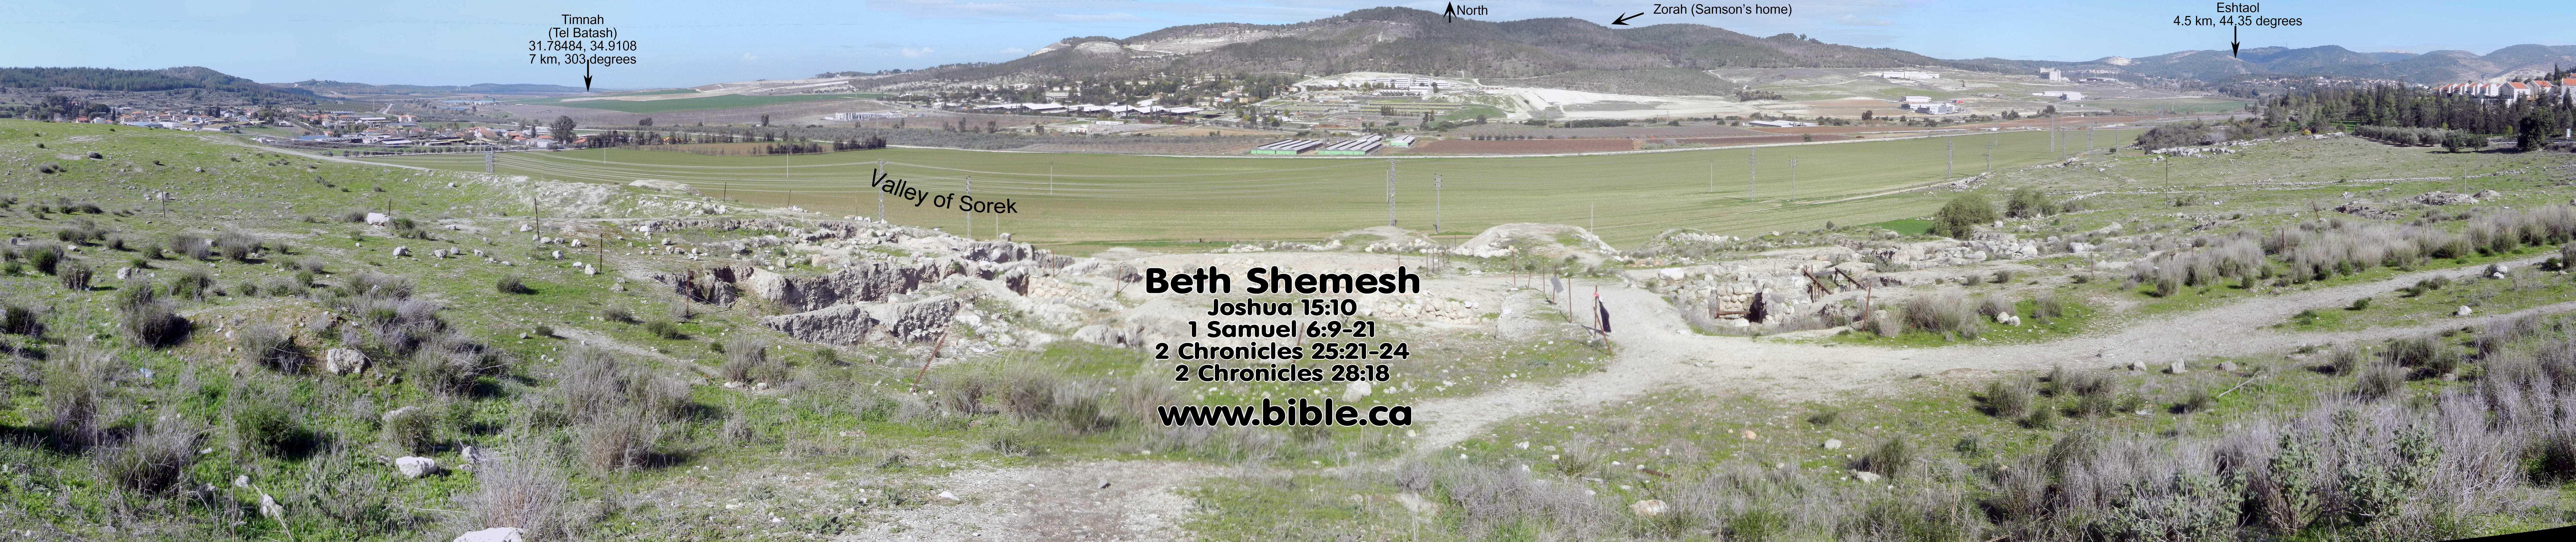 Beth Shemesh Bible Maps: Zorah Israel Map